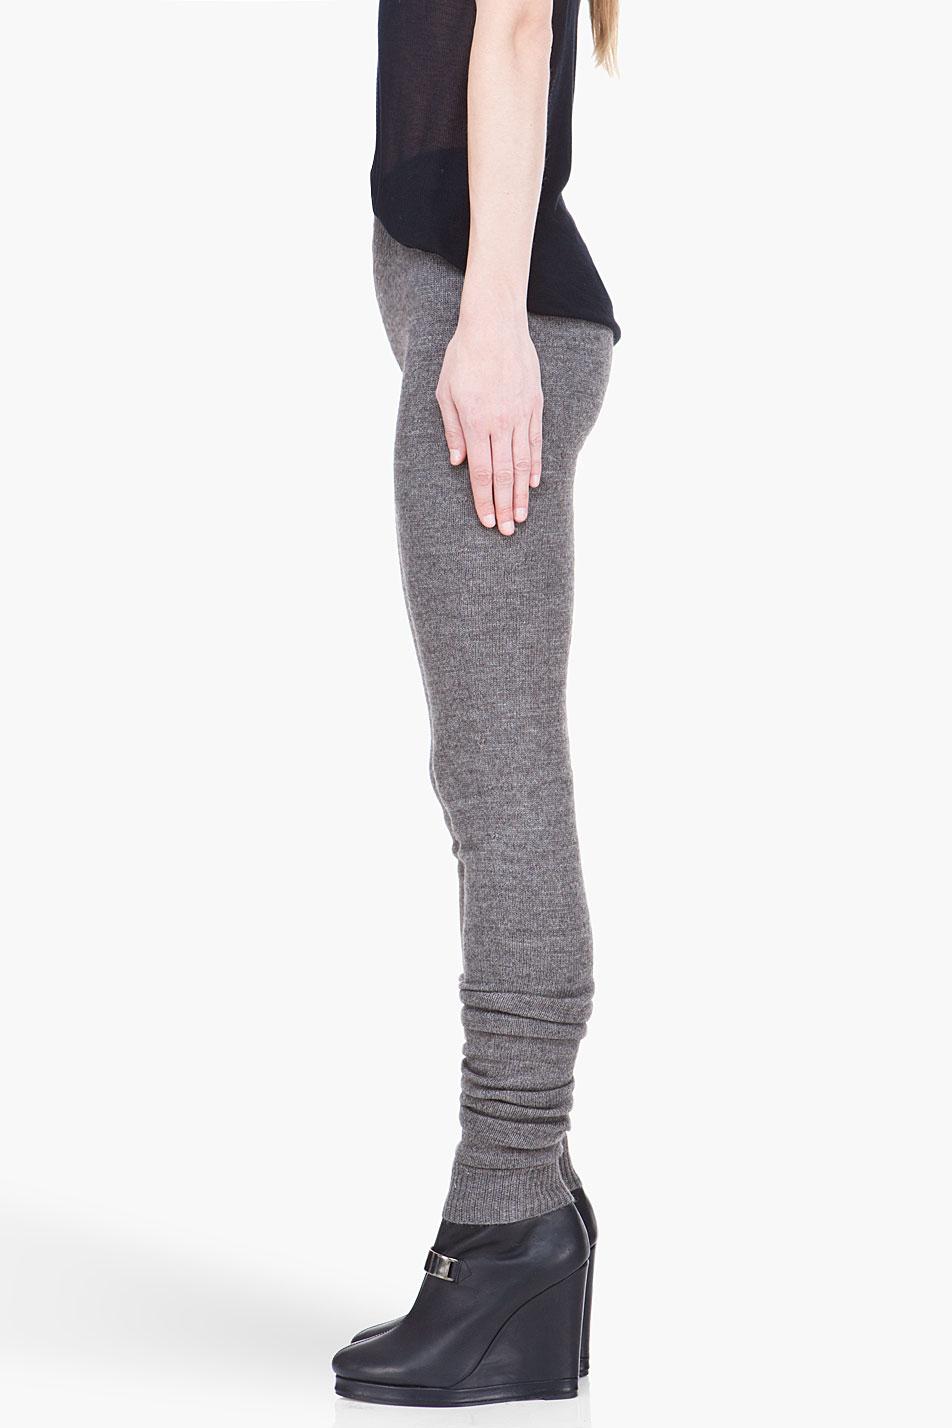 14b9cc589448e Rick Owens Grey Merino Wool Ala Leggings in Gray - Lyst